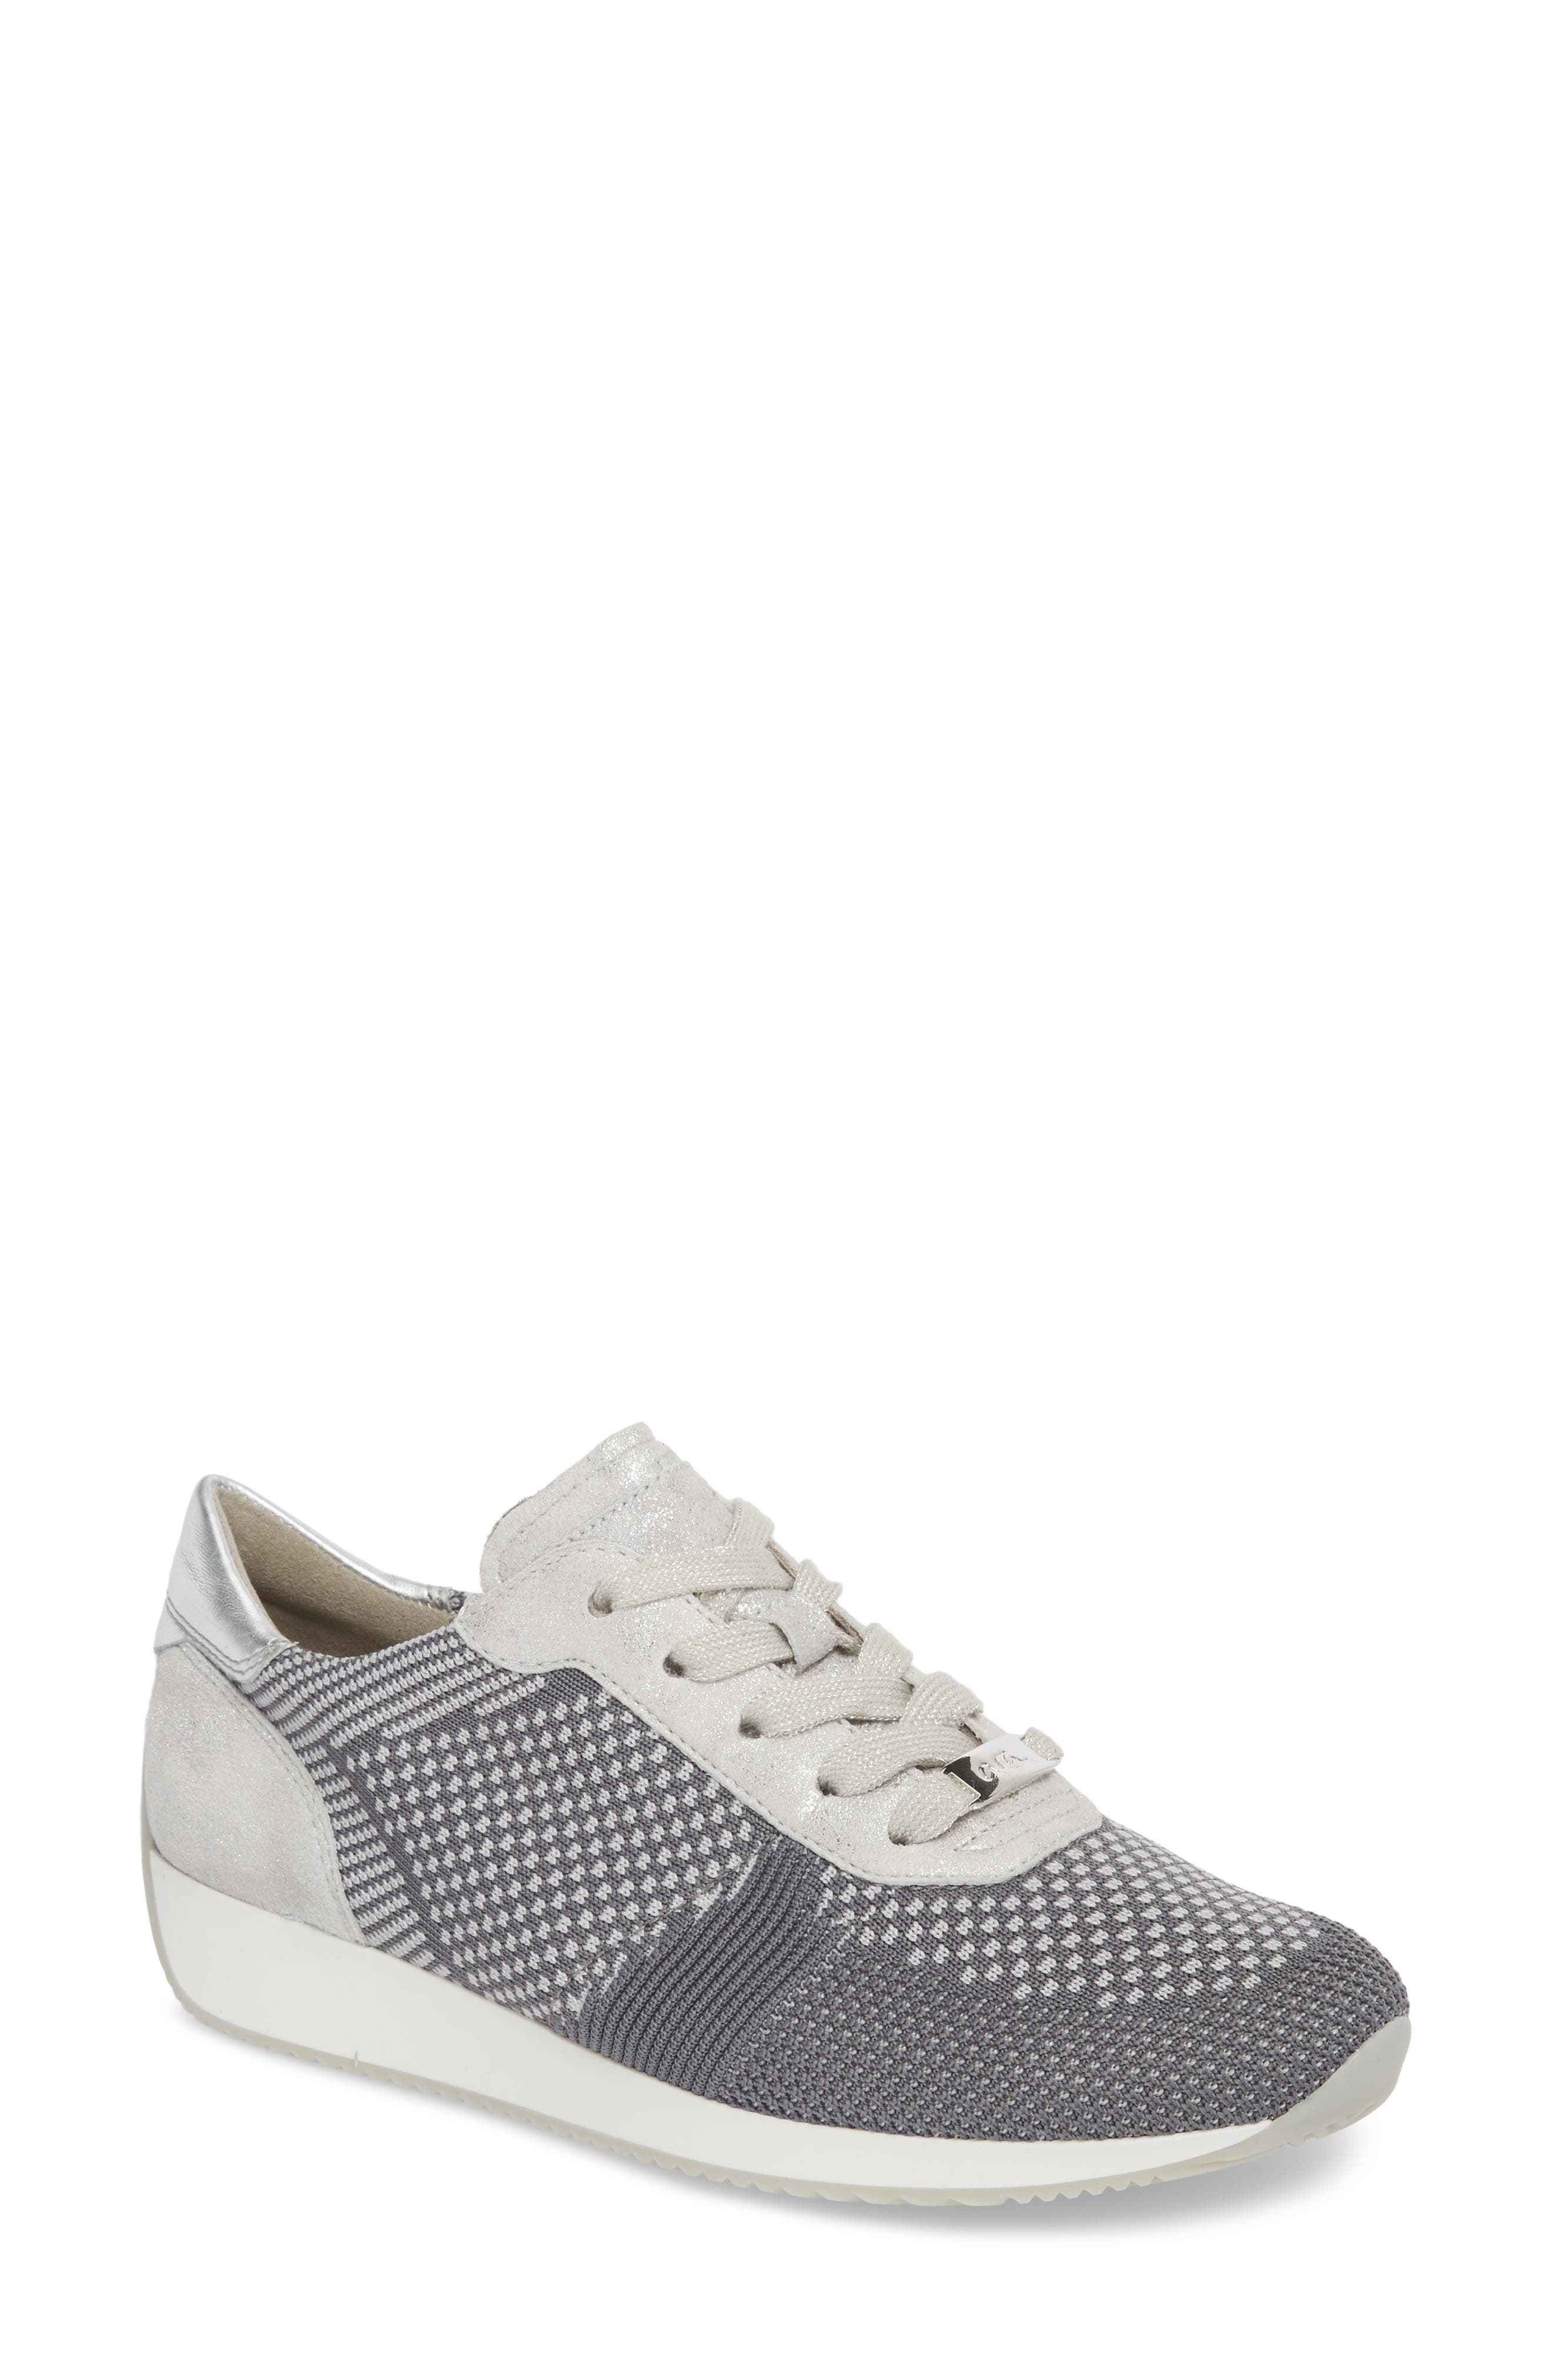 Ara Lilly Sneaker- Grey